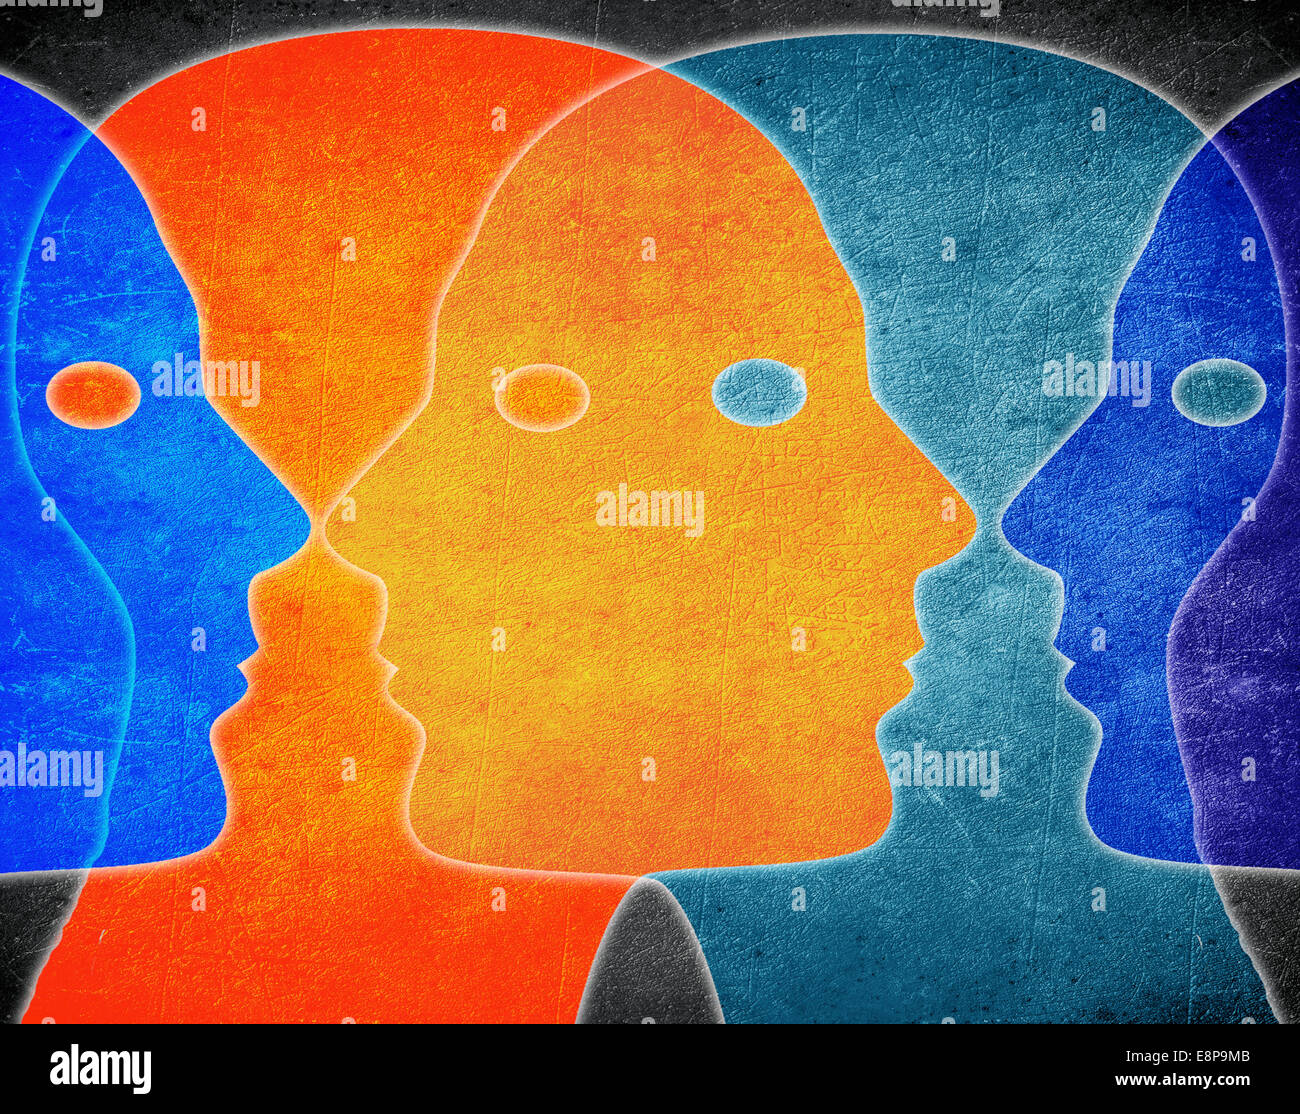 four heads colors digital illustration - Stock Image